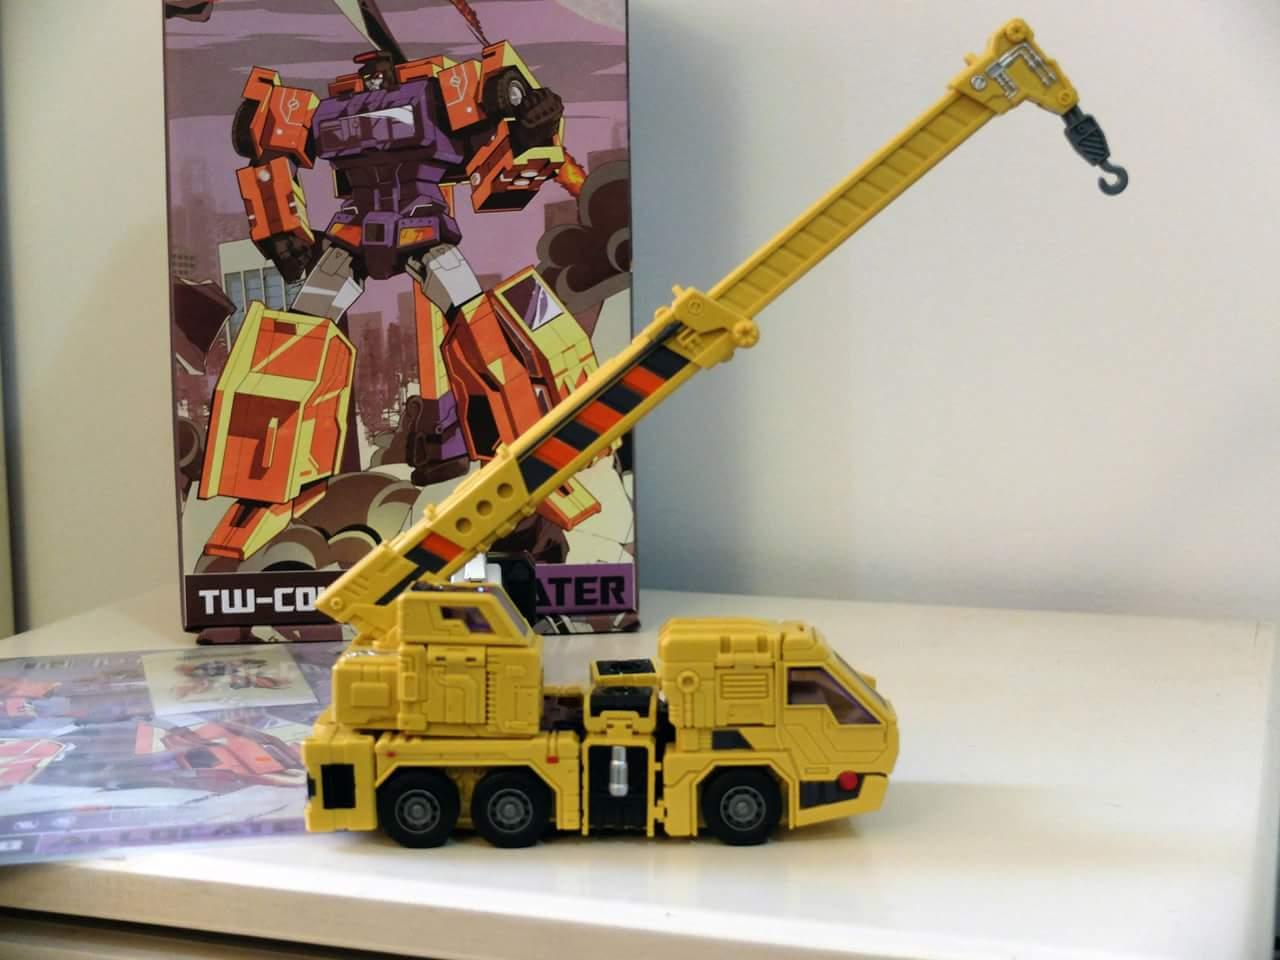 [Toyworld] Produit Tiers - Jouet TW-C Constructor aka Devastator/Dévastateur (Version vert G1 et jaune G2) - Page 8 In9i5jme